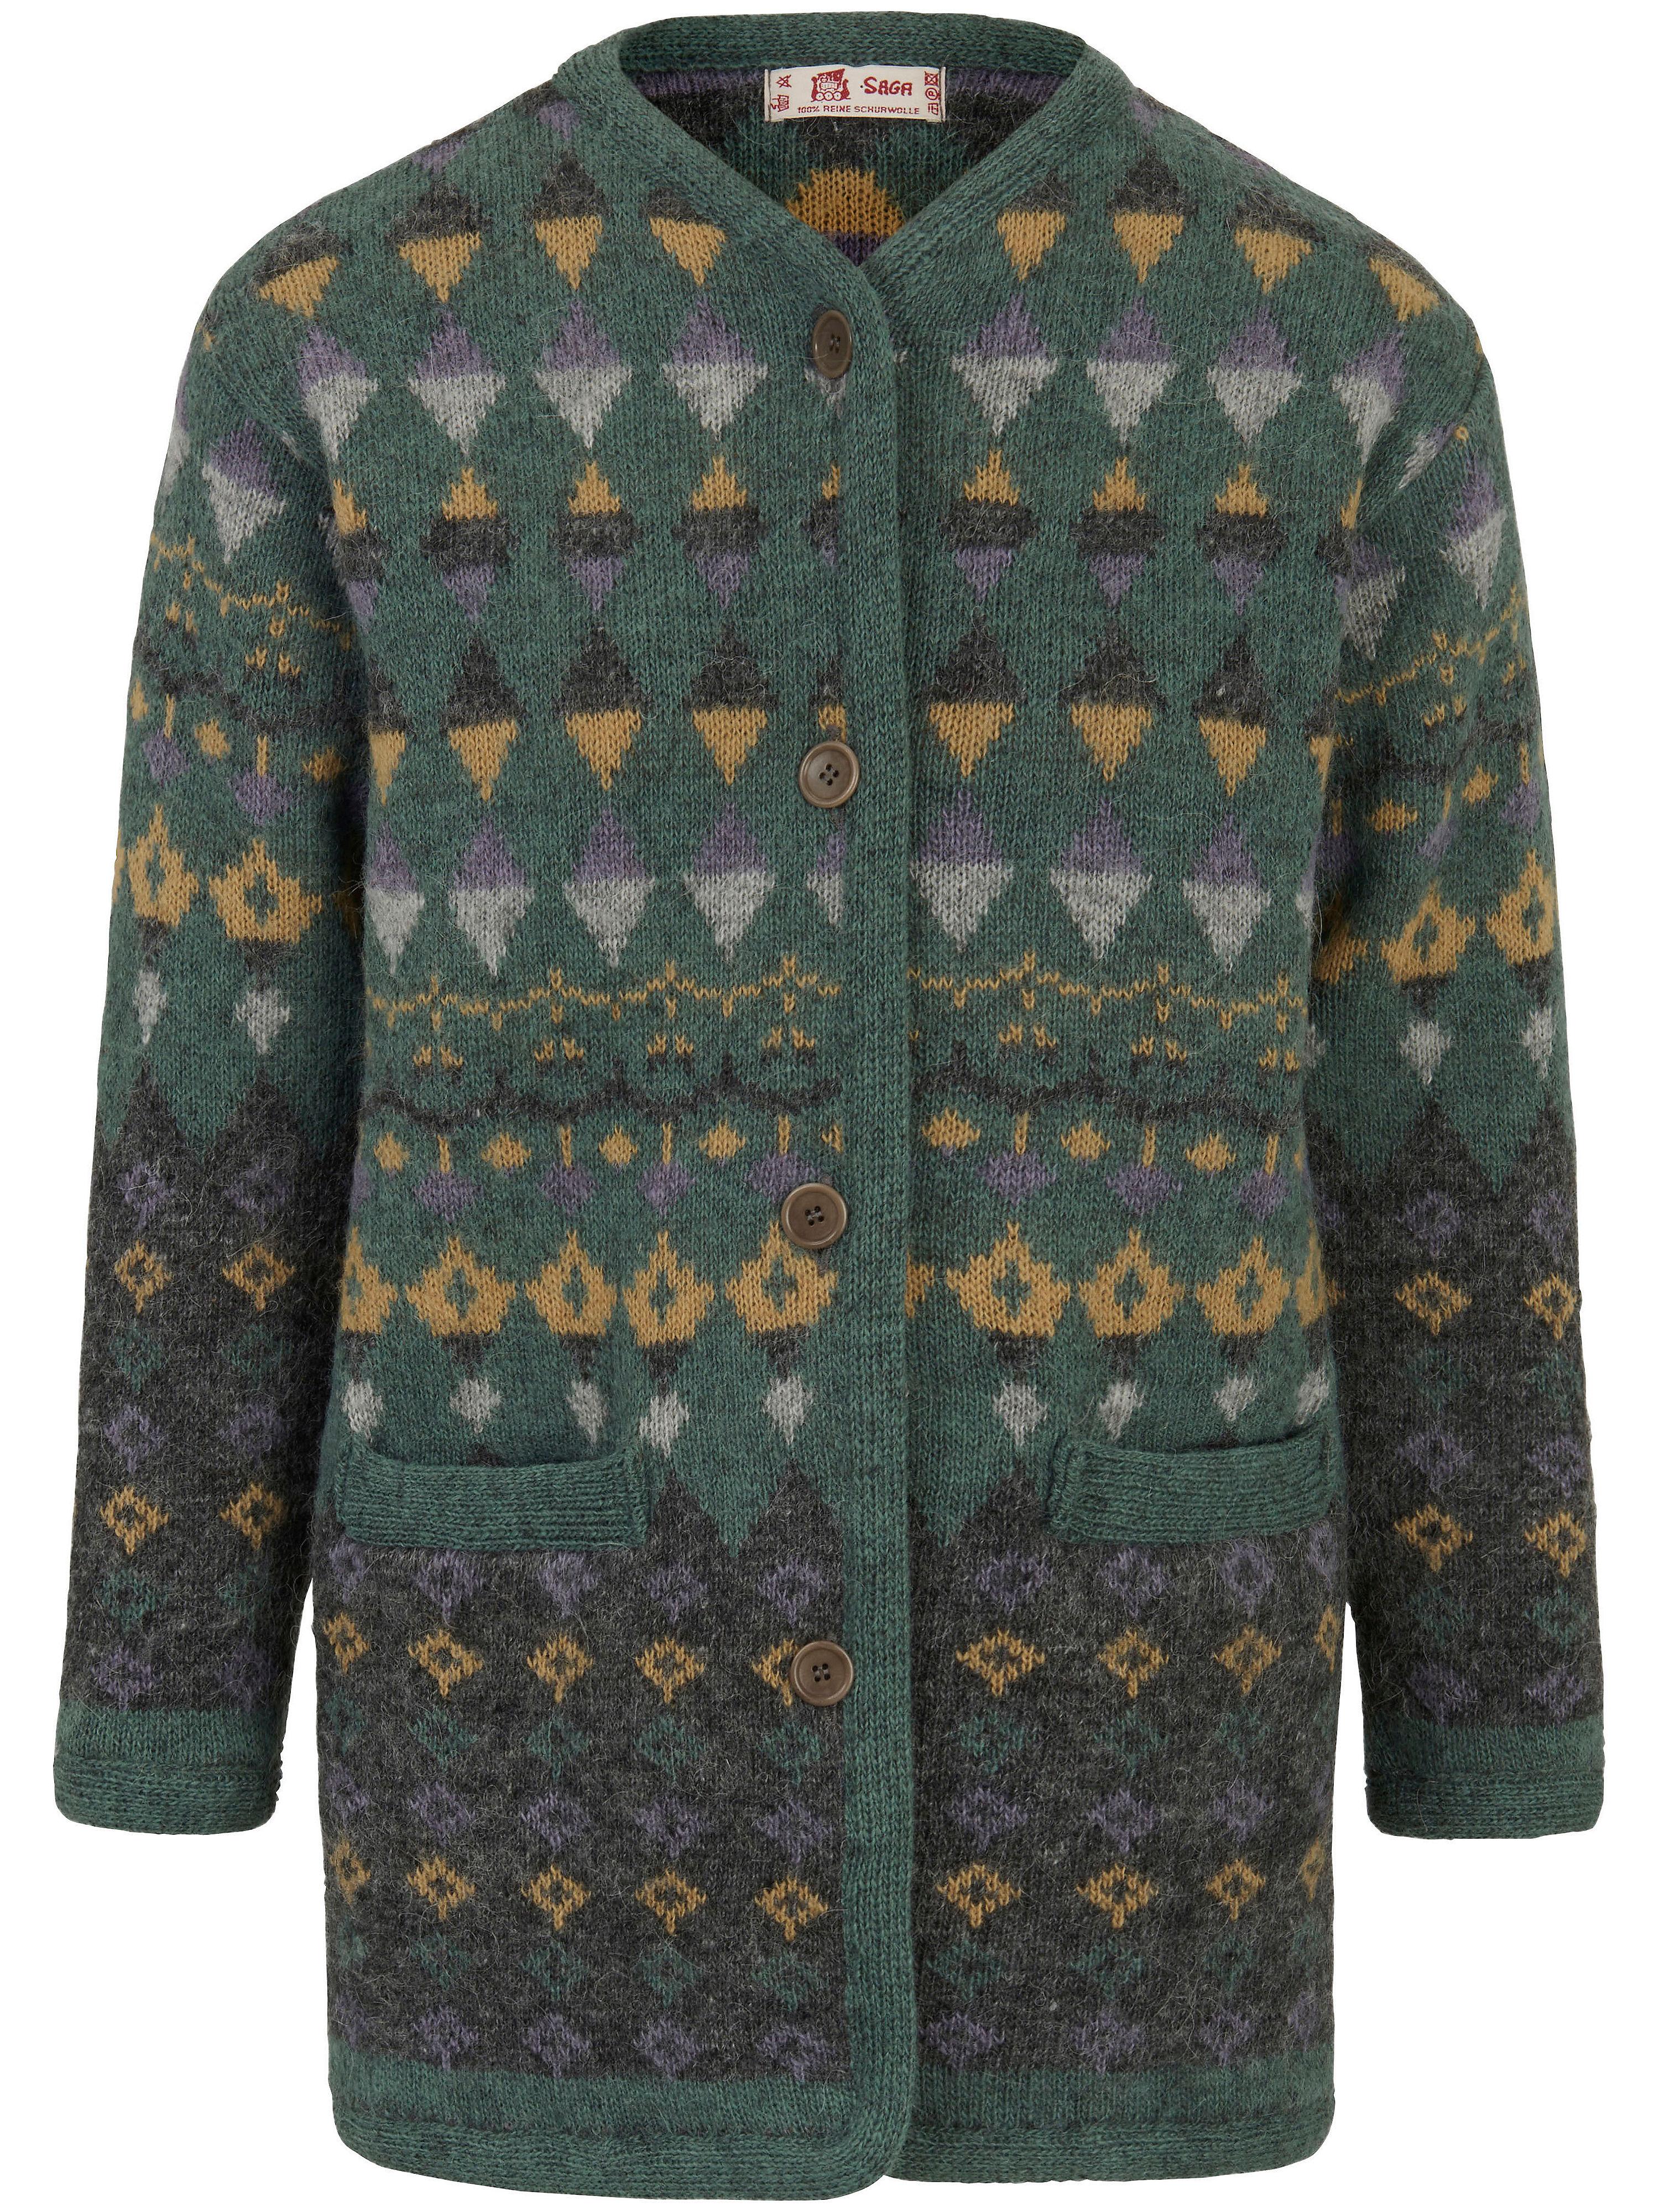 Image of   Jacquardjakke i 100% ren ny uld Fra SAGA multicolor